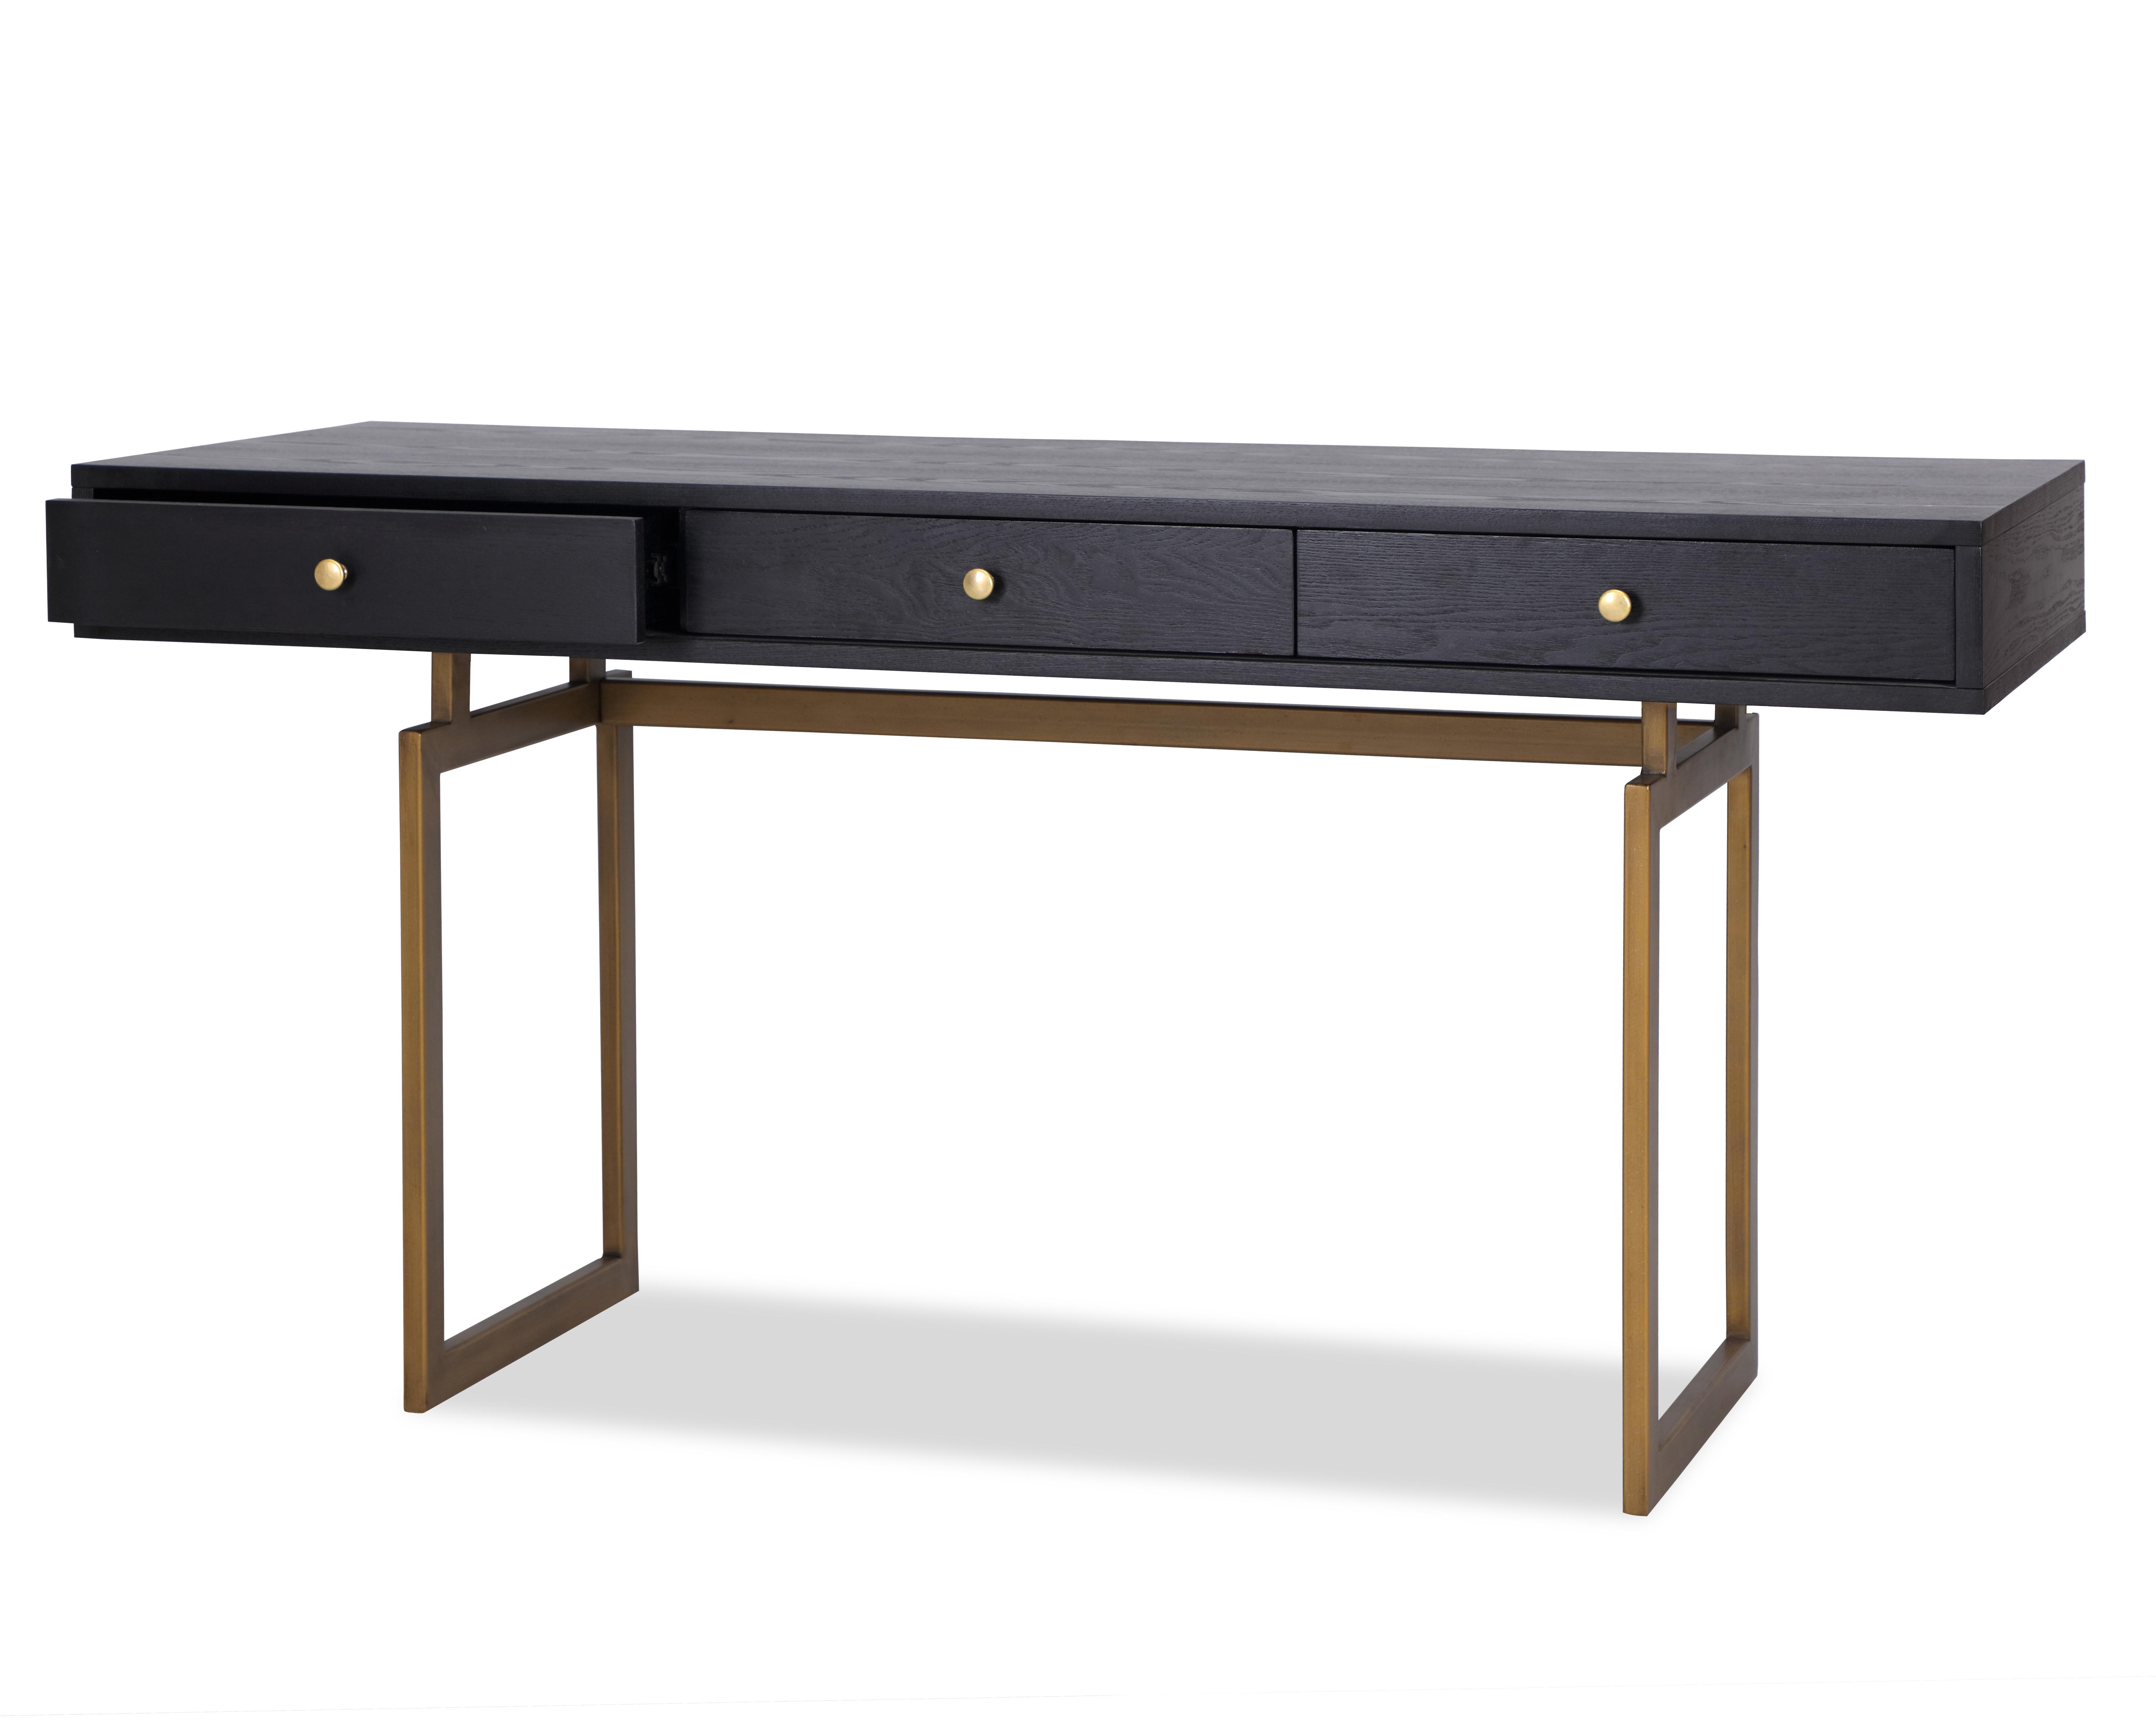 LE-Hamilton Desk Black Ash Venner & Brass Brush Painted (4)